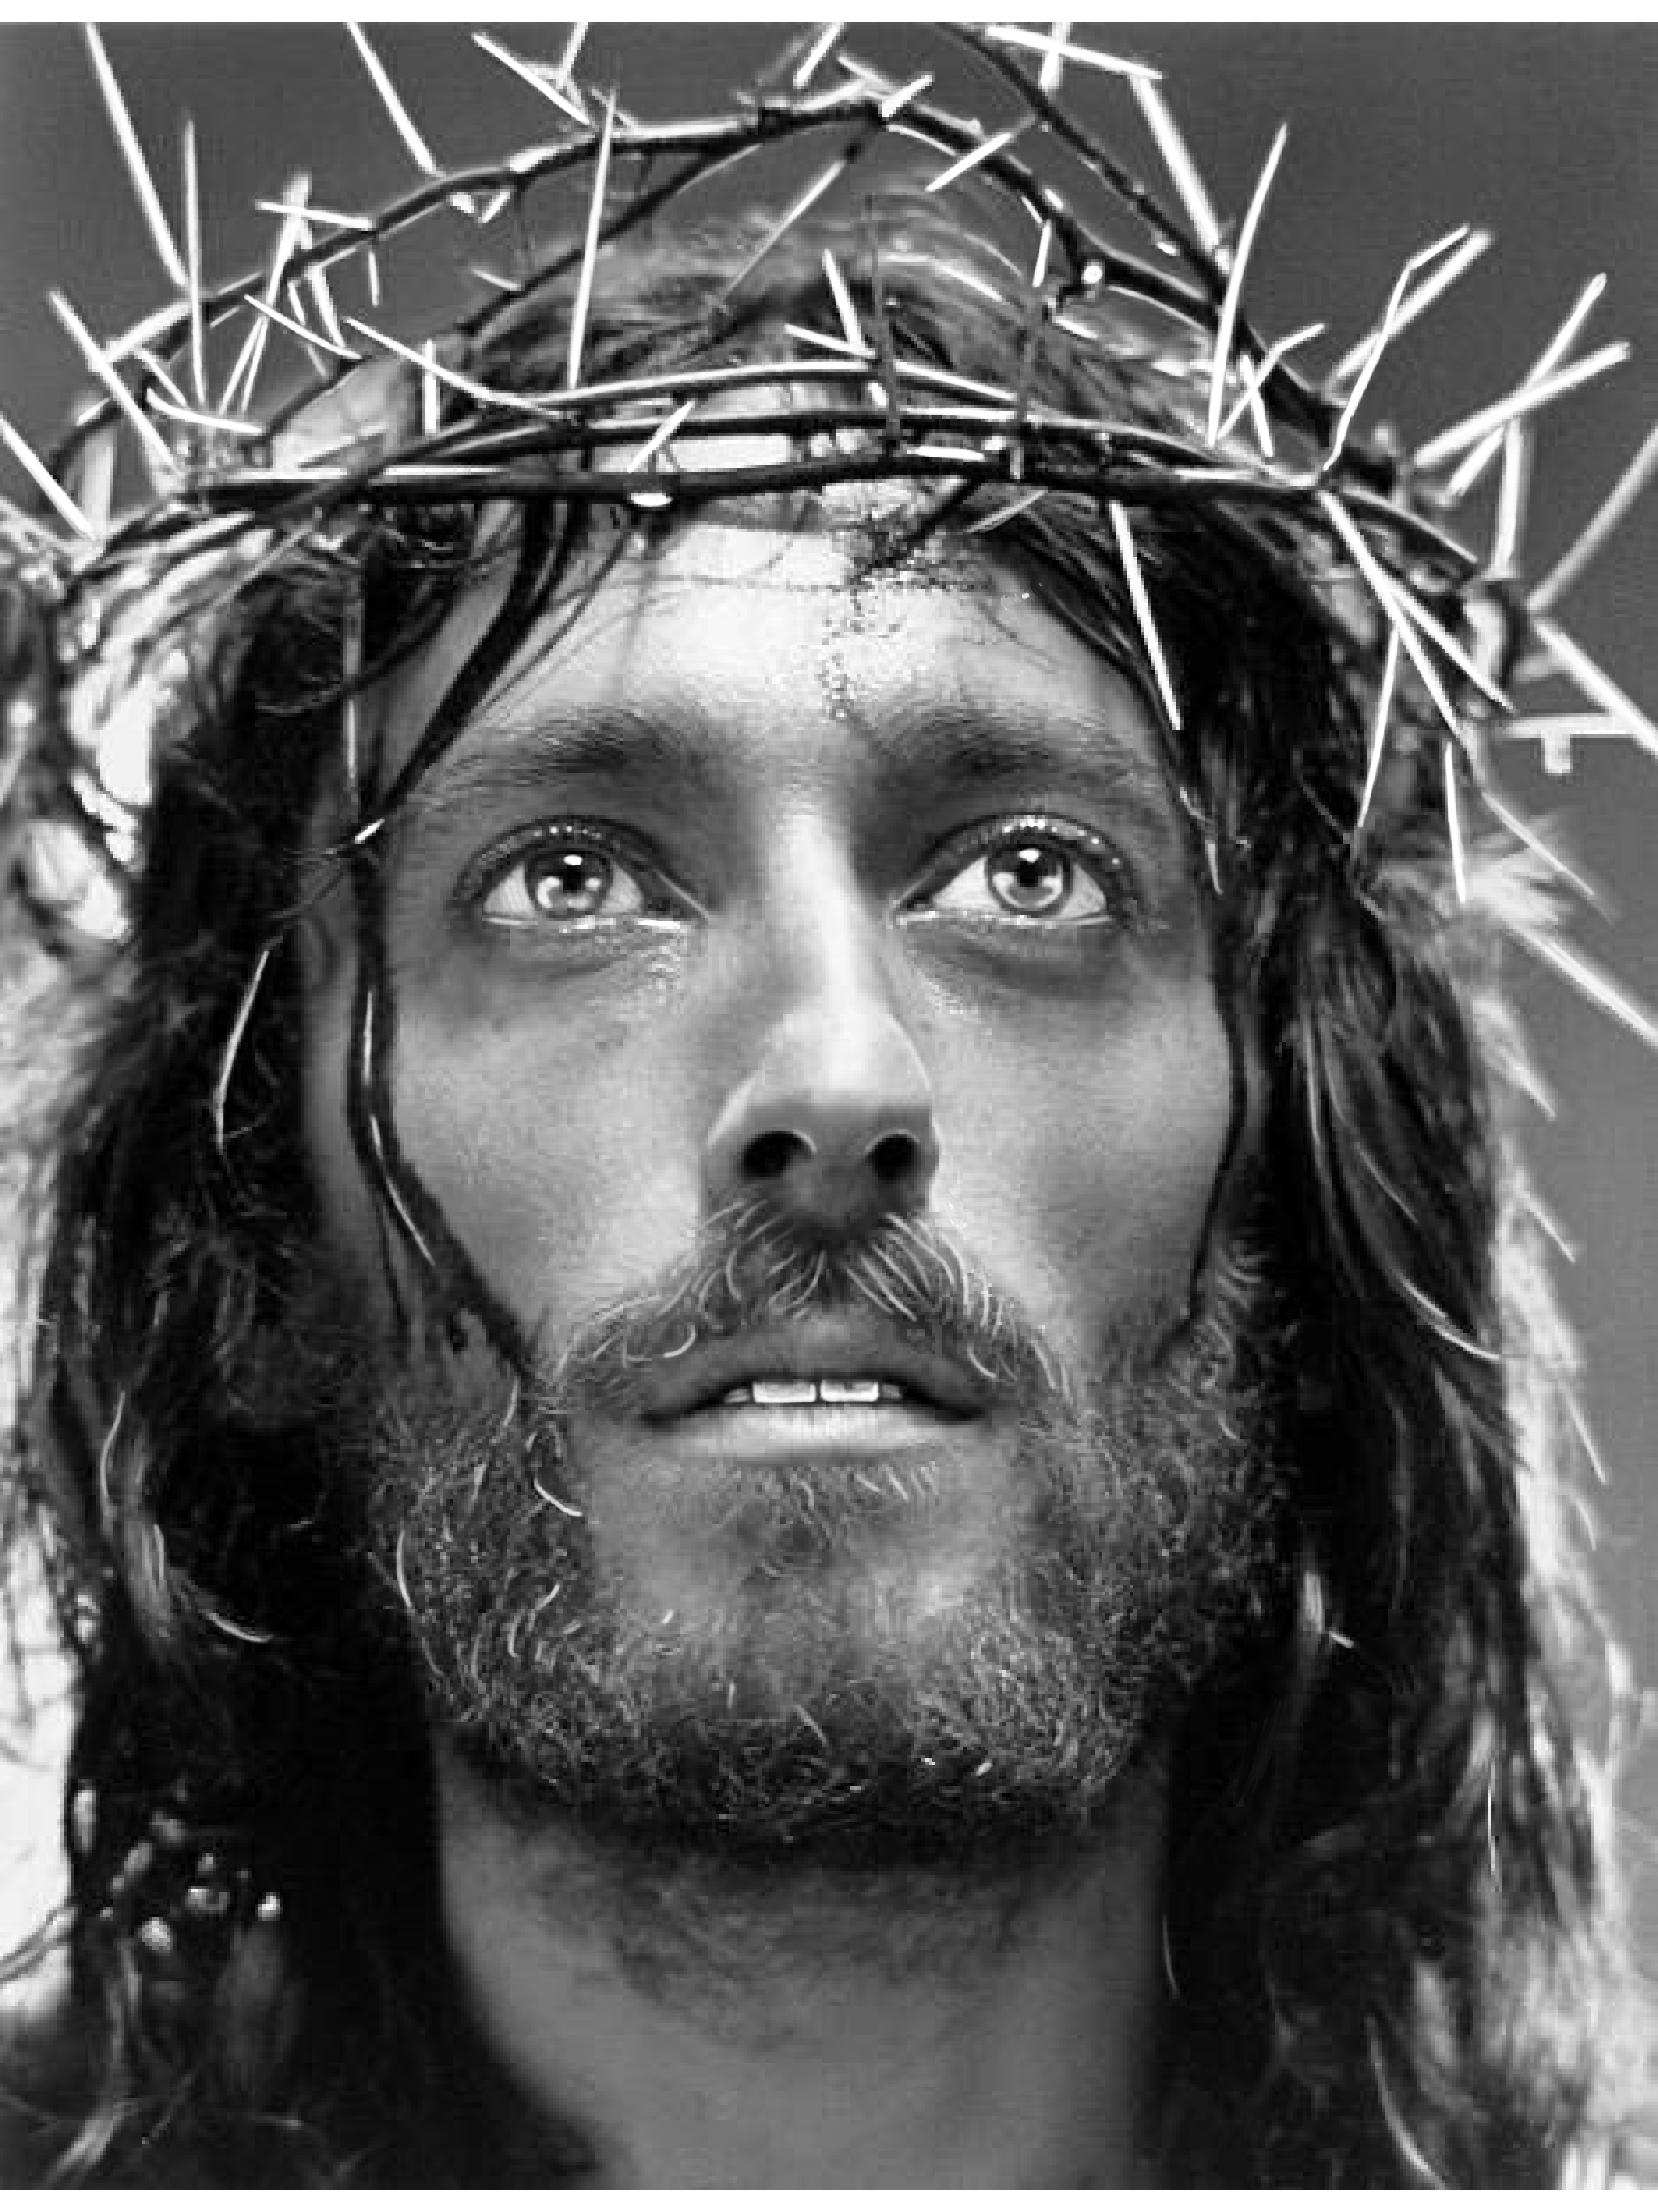 Pin By Maricarmen Guerrero On Meus Desenhos Jesus Christ Portrait Christ Tattoo Jesus Christ Tattoo